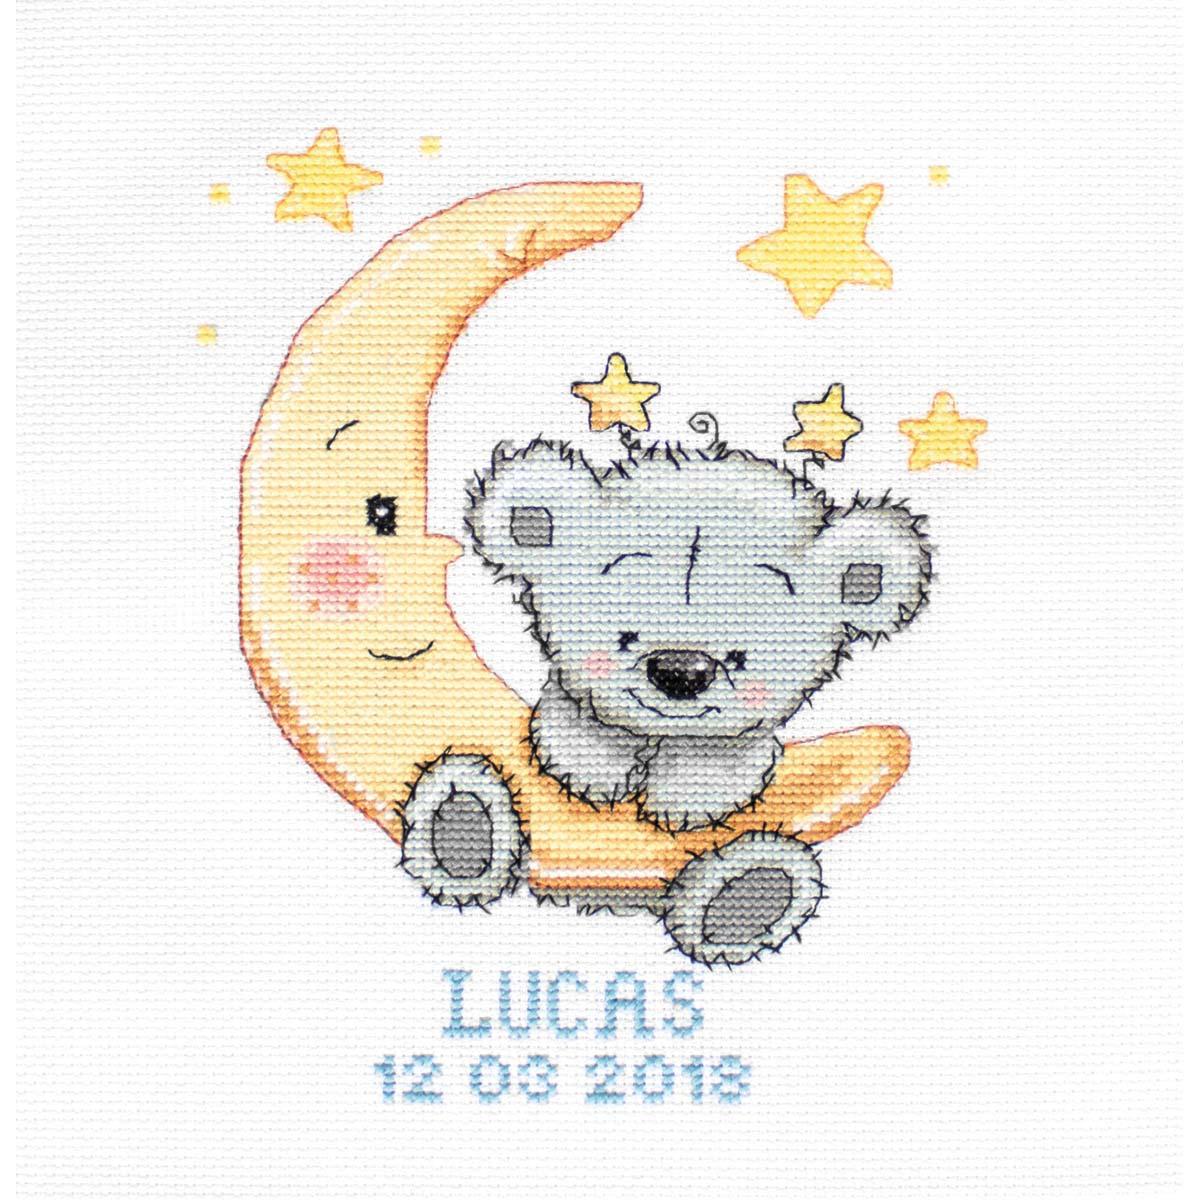 B1146 Набор для вышивания 'Лукас' 13*16,5 см, Luca-S фото